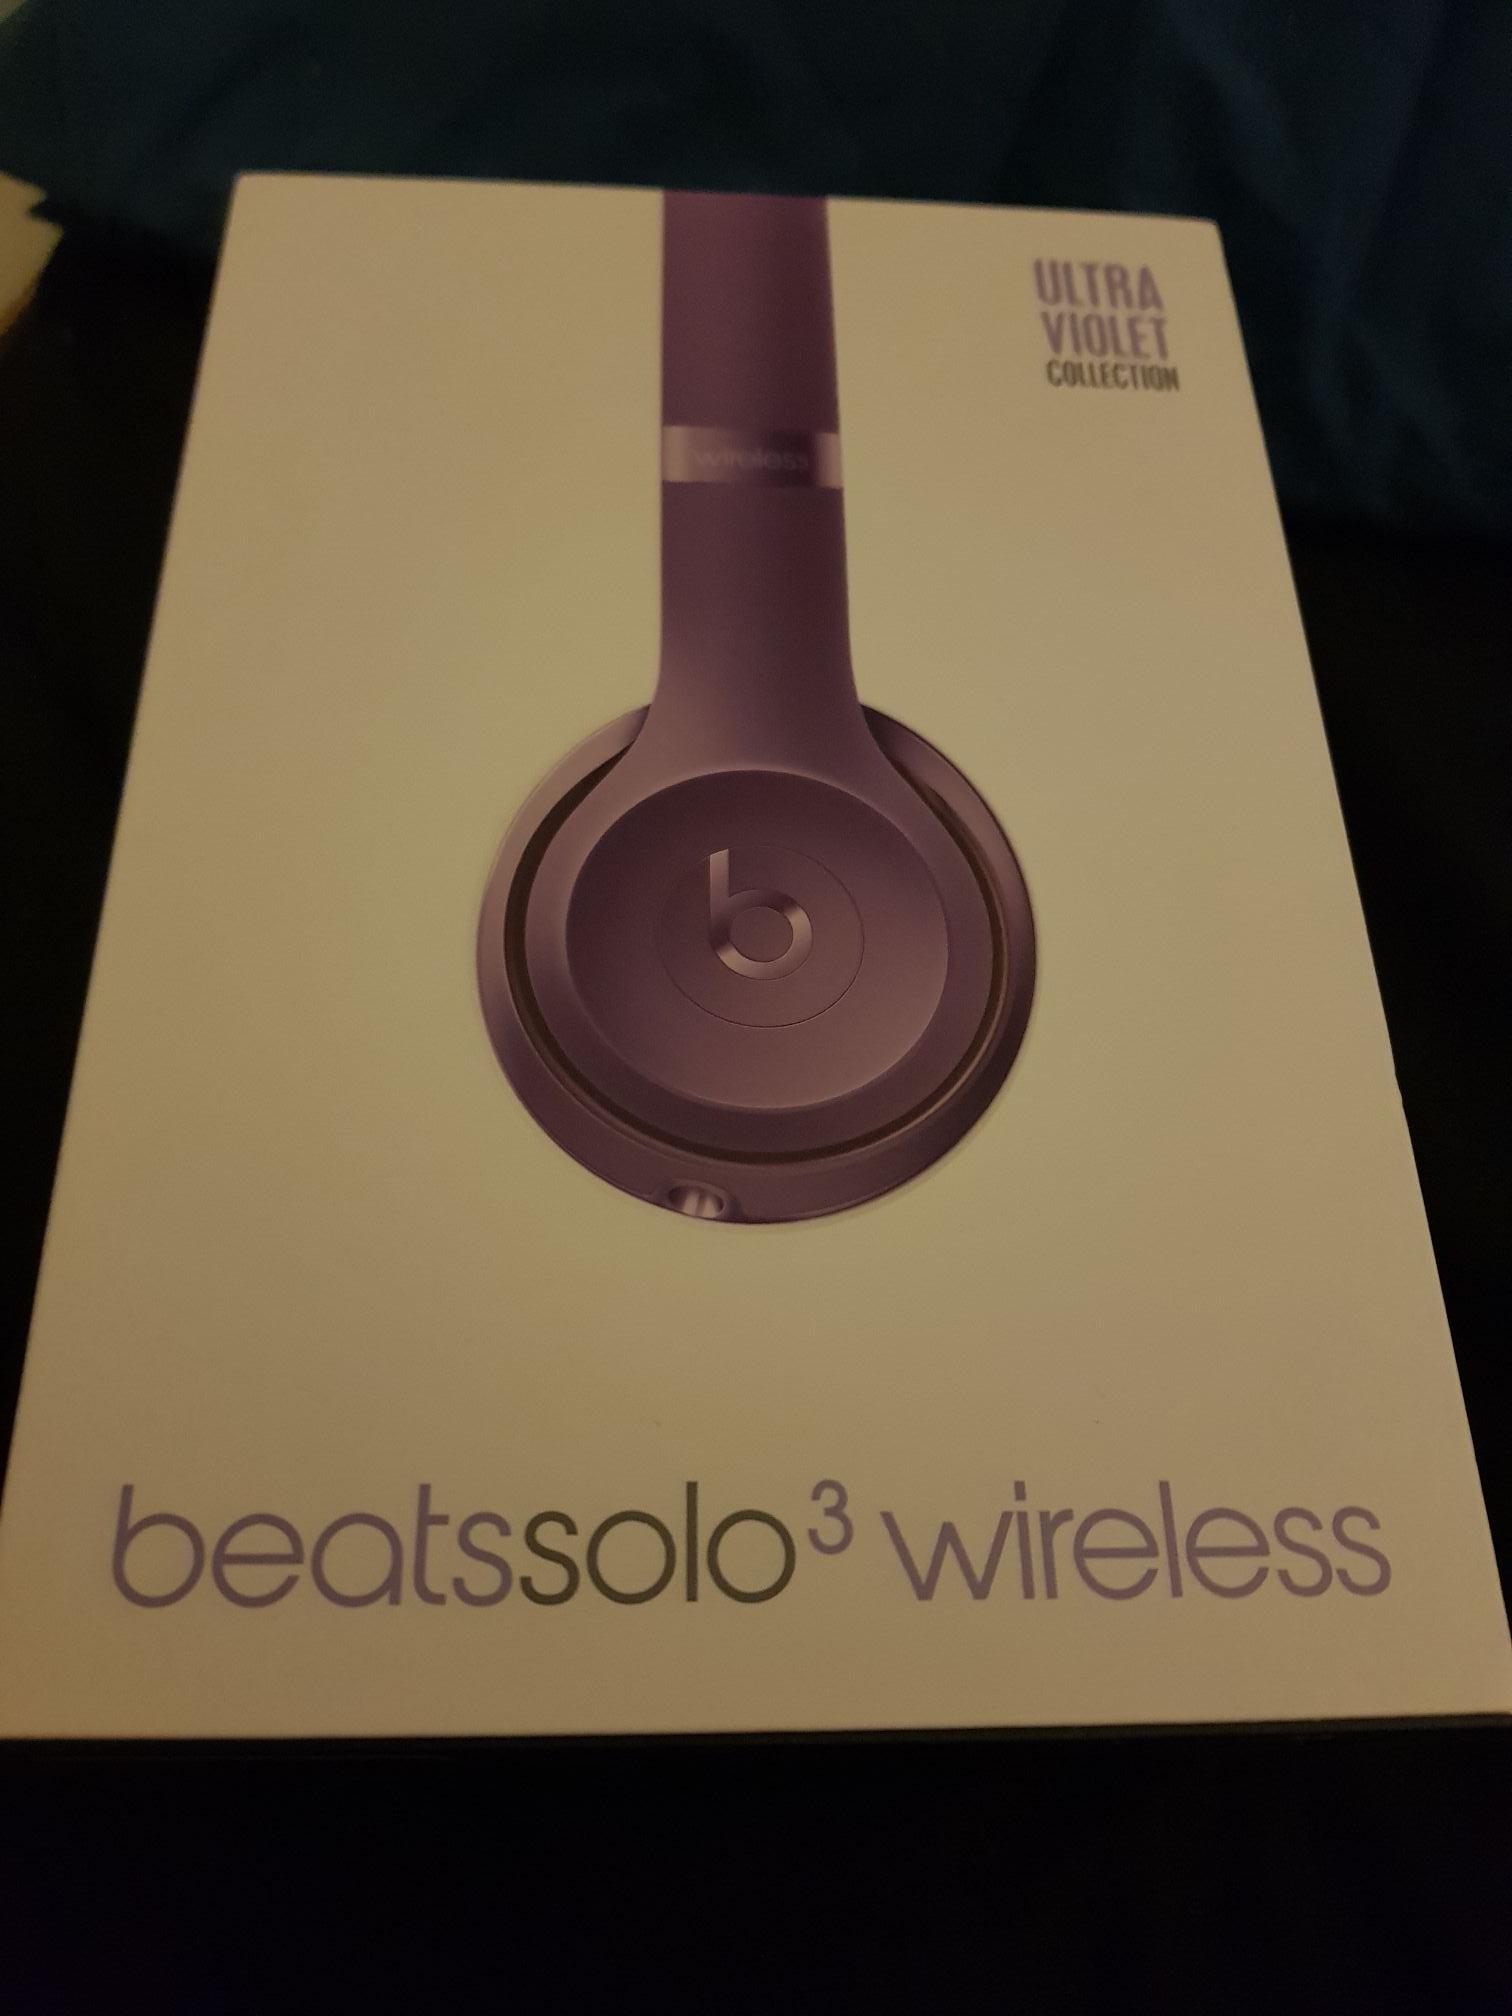 Beats Solo3 Wireless £124.74 In the Maplin's on Great Portland St (Oxford St end)